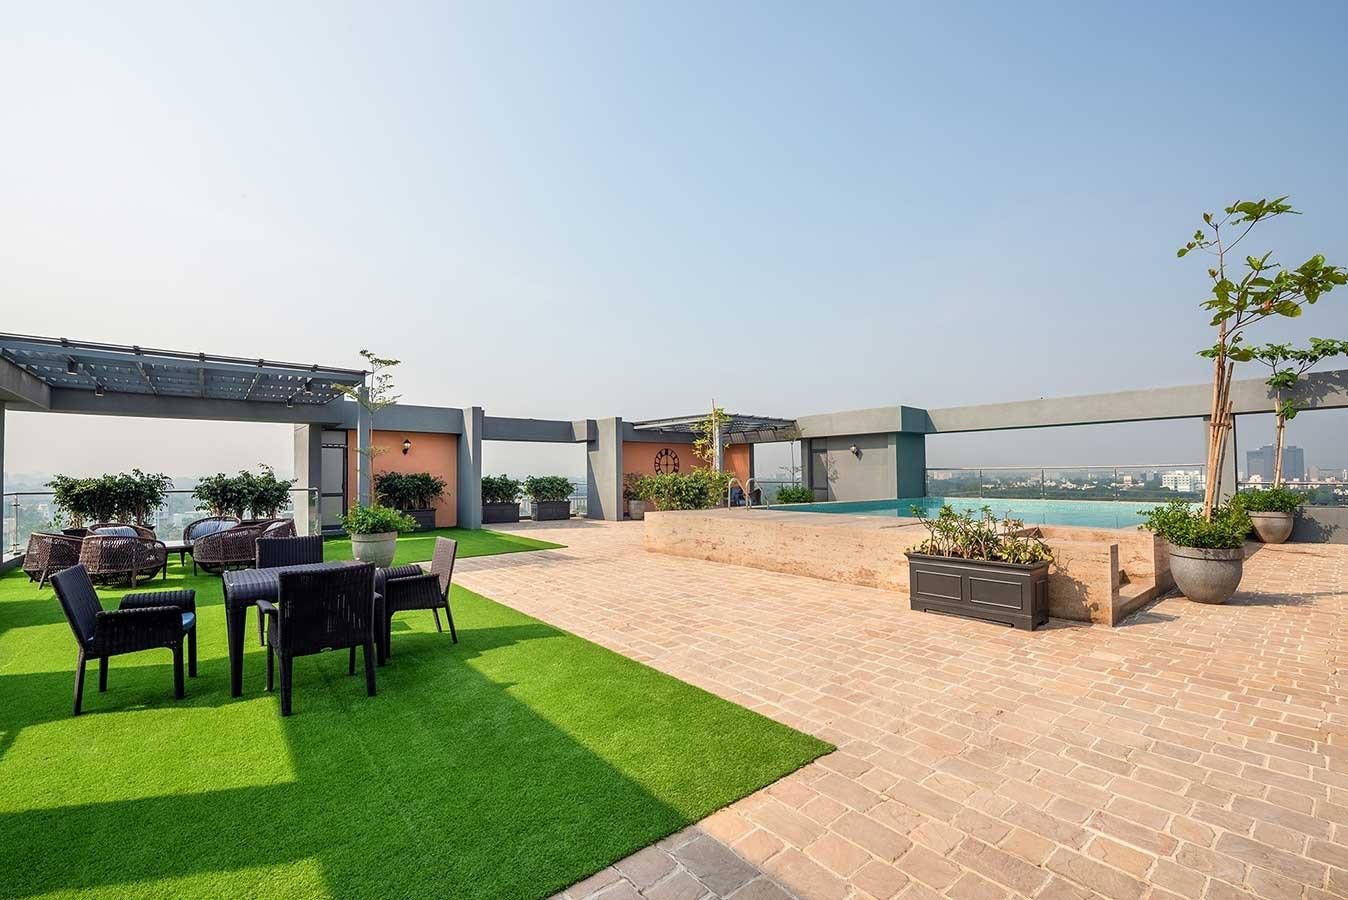 amar westview project amenities features3